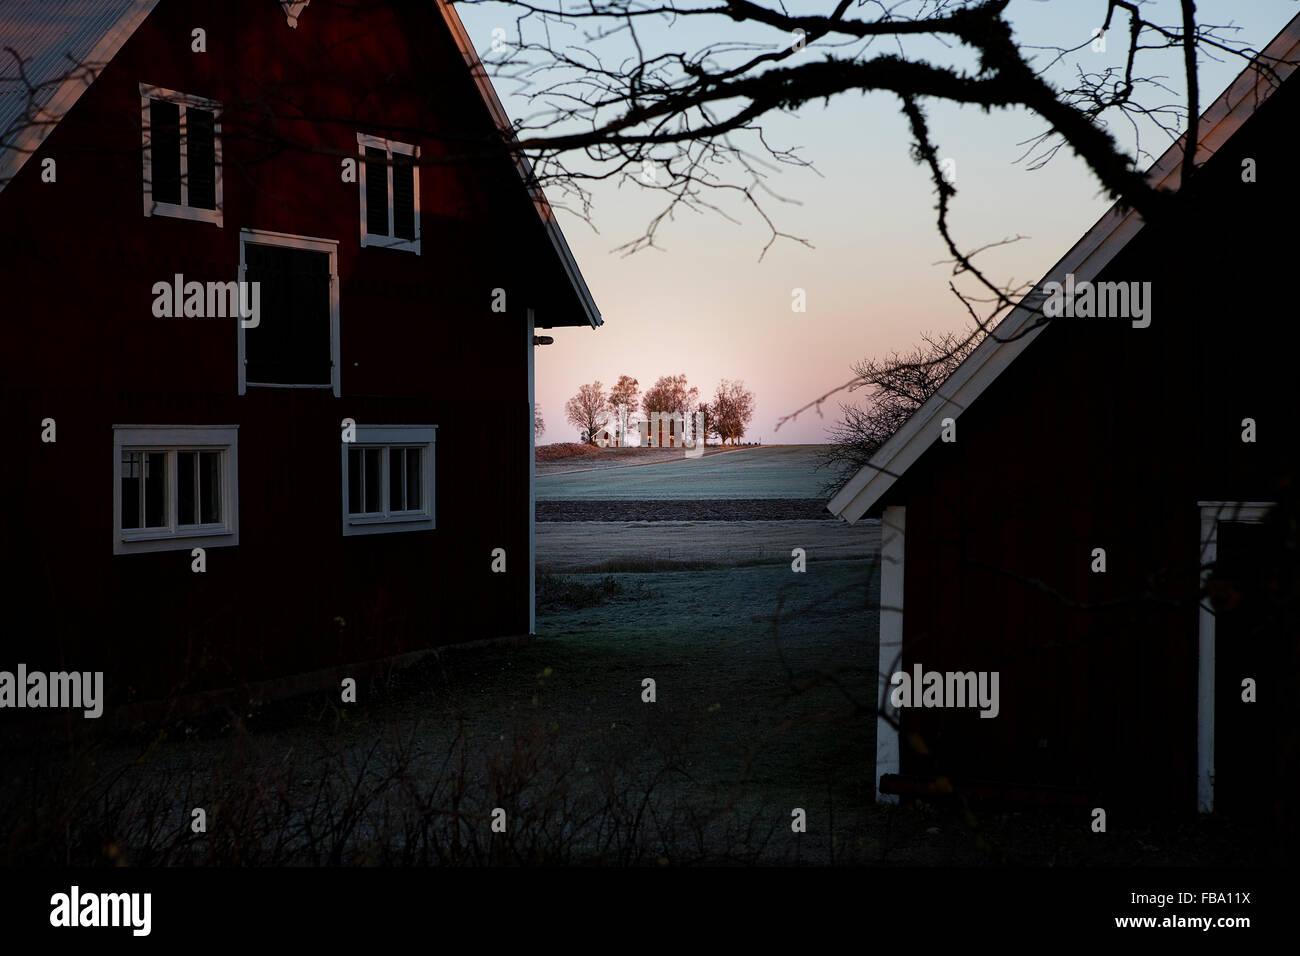 Schweden, Ostergotland, Vaderstad, bereifte Häuser und Feld Stockbild